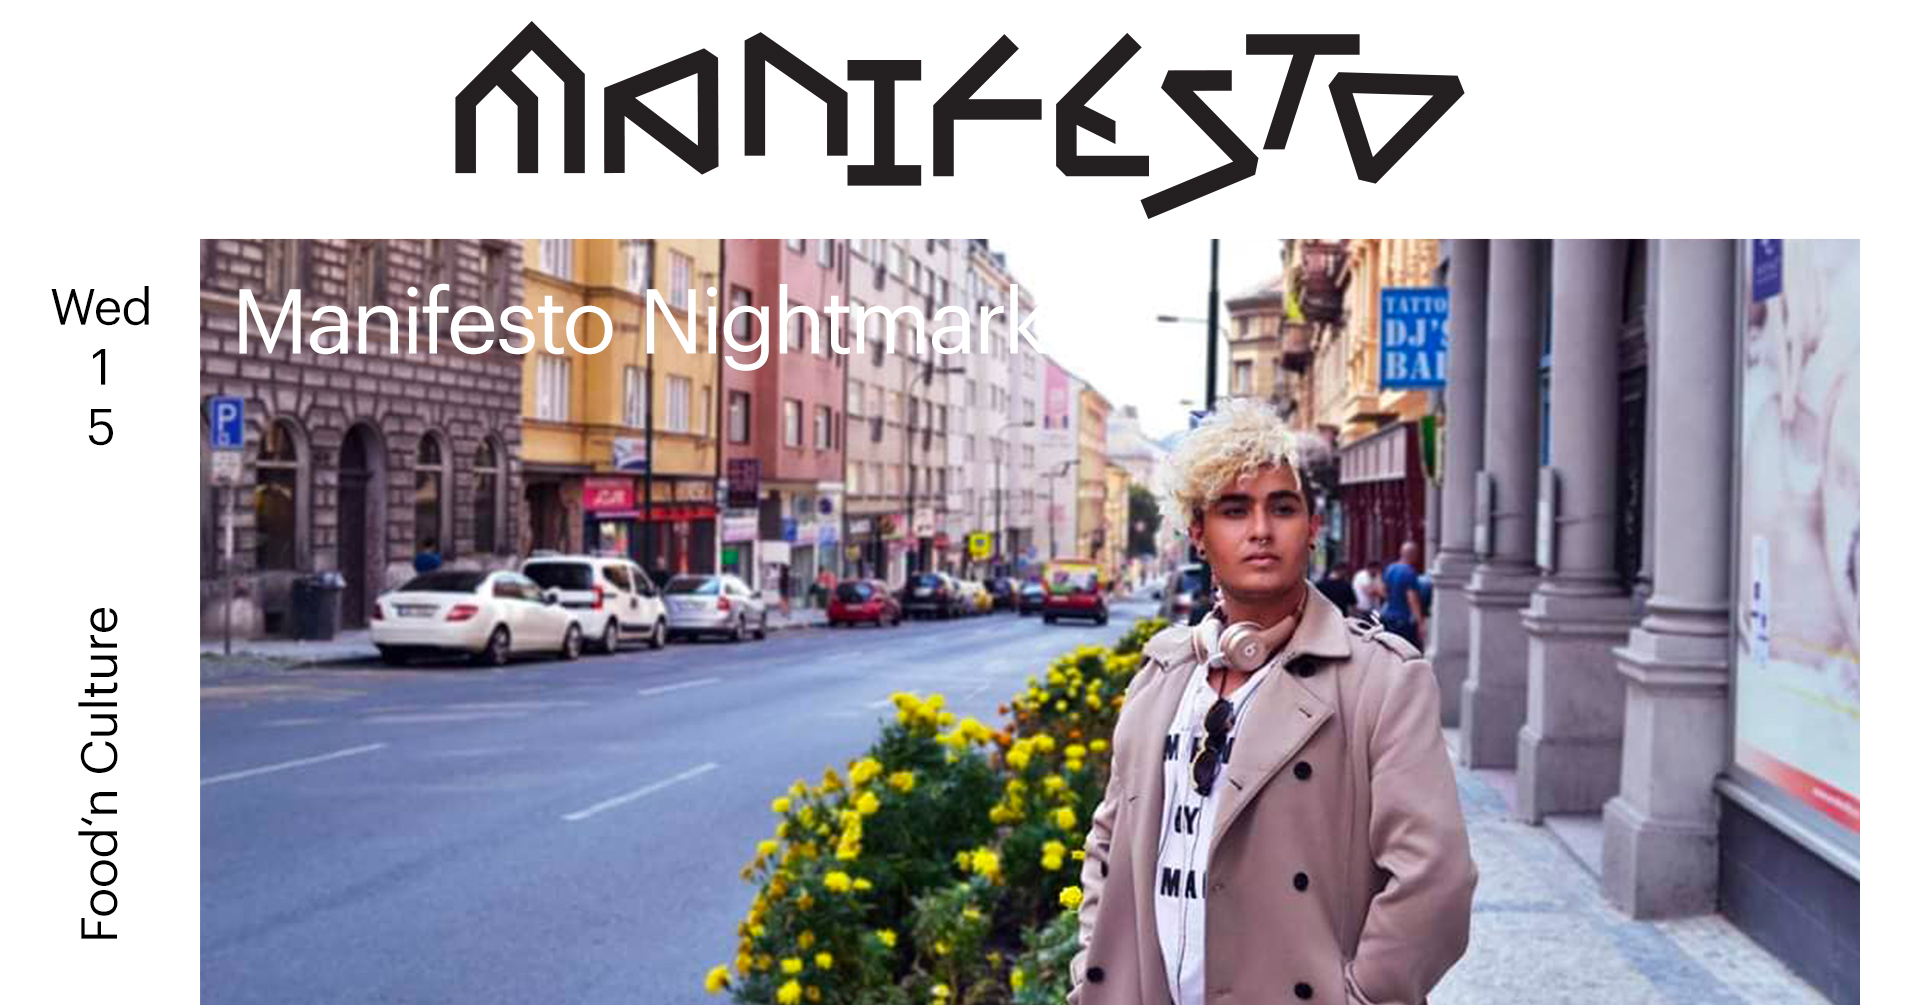 manifesto_2019-FB_EVENT thing.jpg